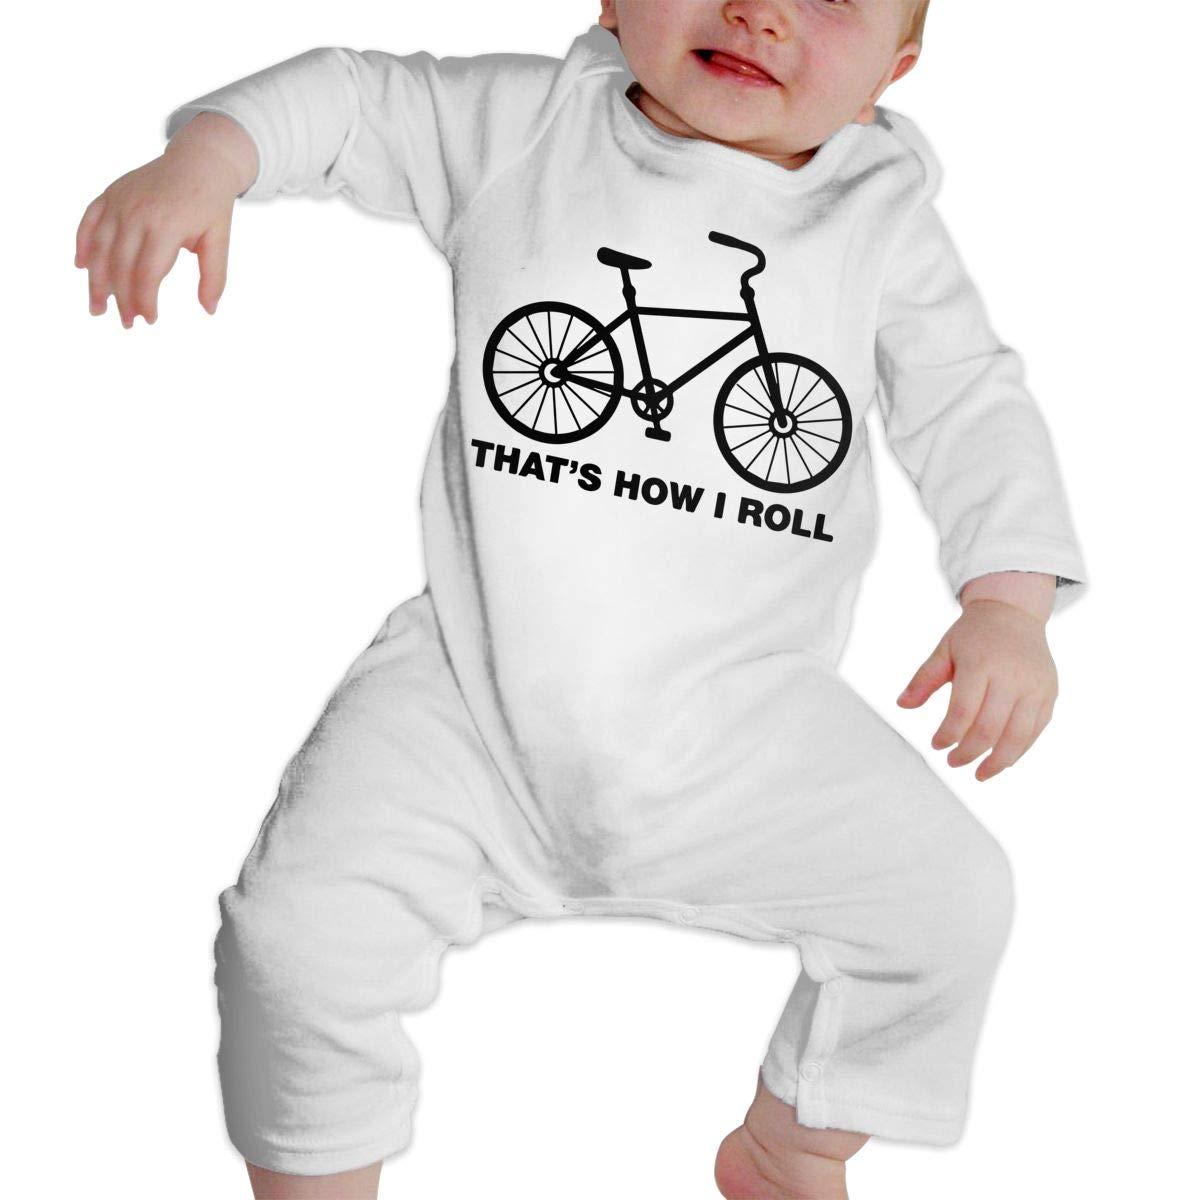 LBJQ8 Thats How I Roll Bike1 Newborn Kids Baby Boys Long Sleeve Romper Jumpsuit